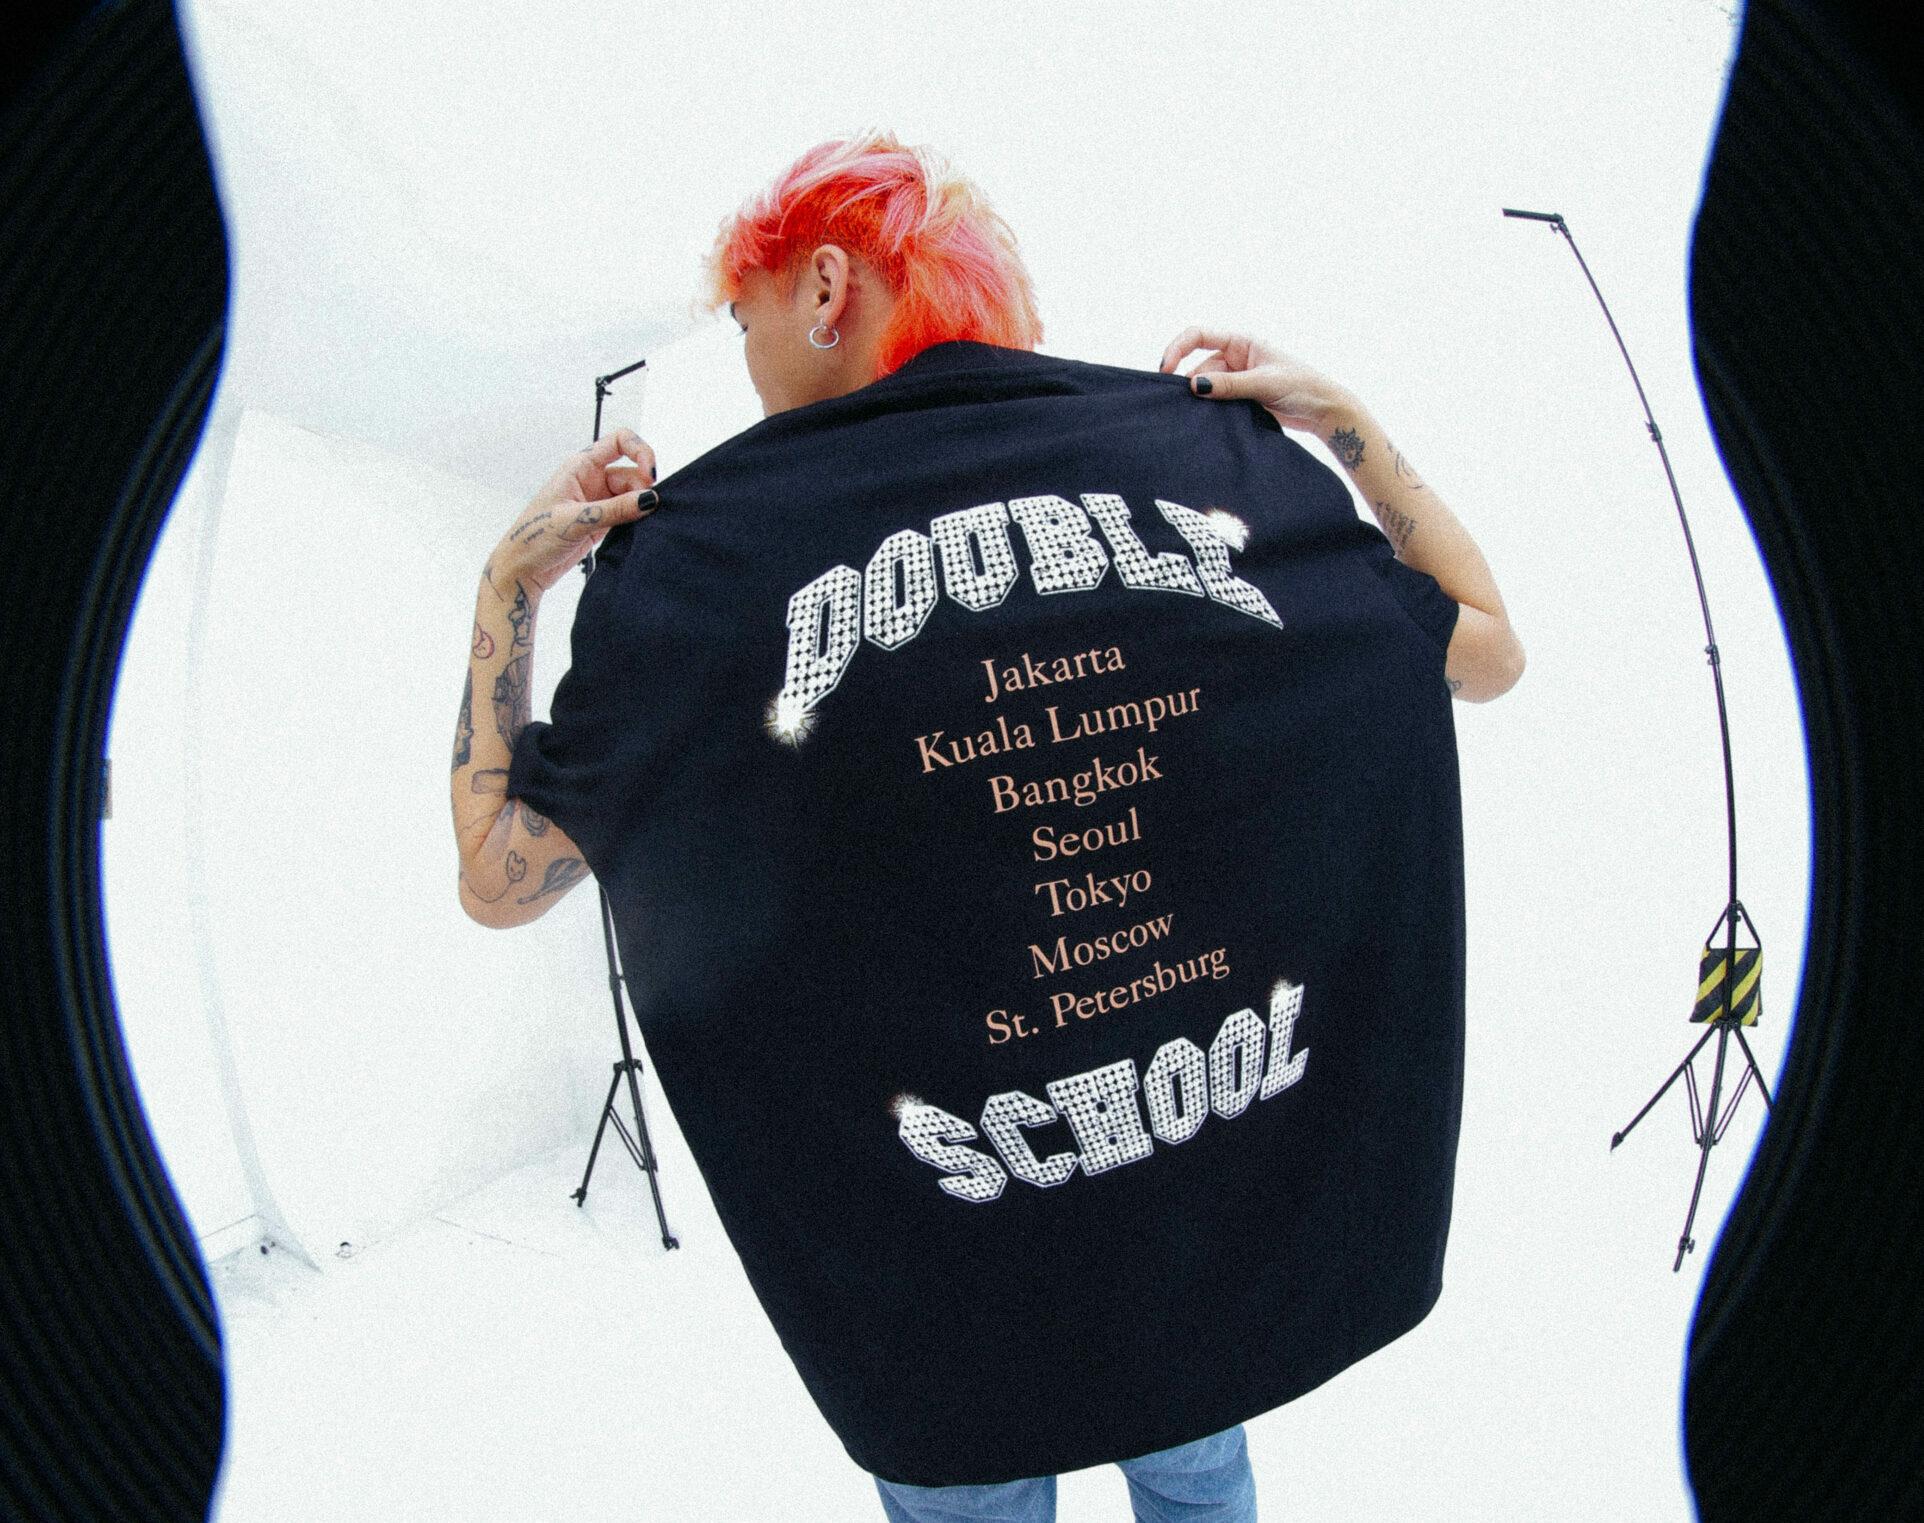 Doubleschool Rayakan Kultur Musik Hip-Hop Lewat Koleksi Terbaru